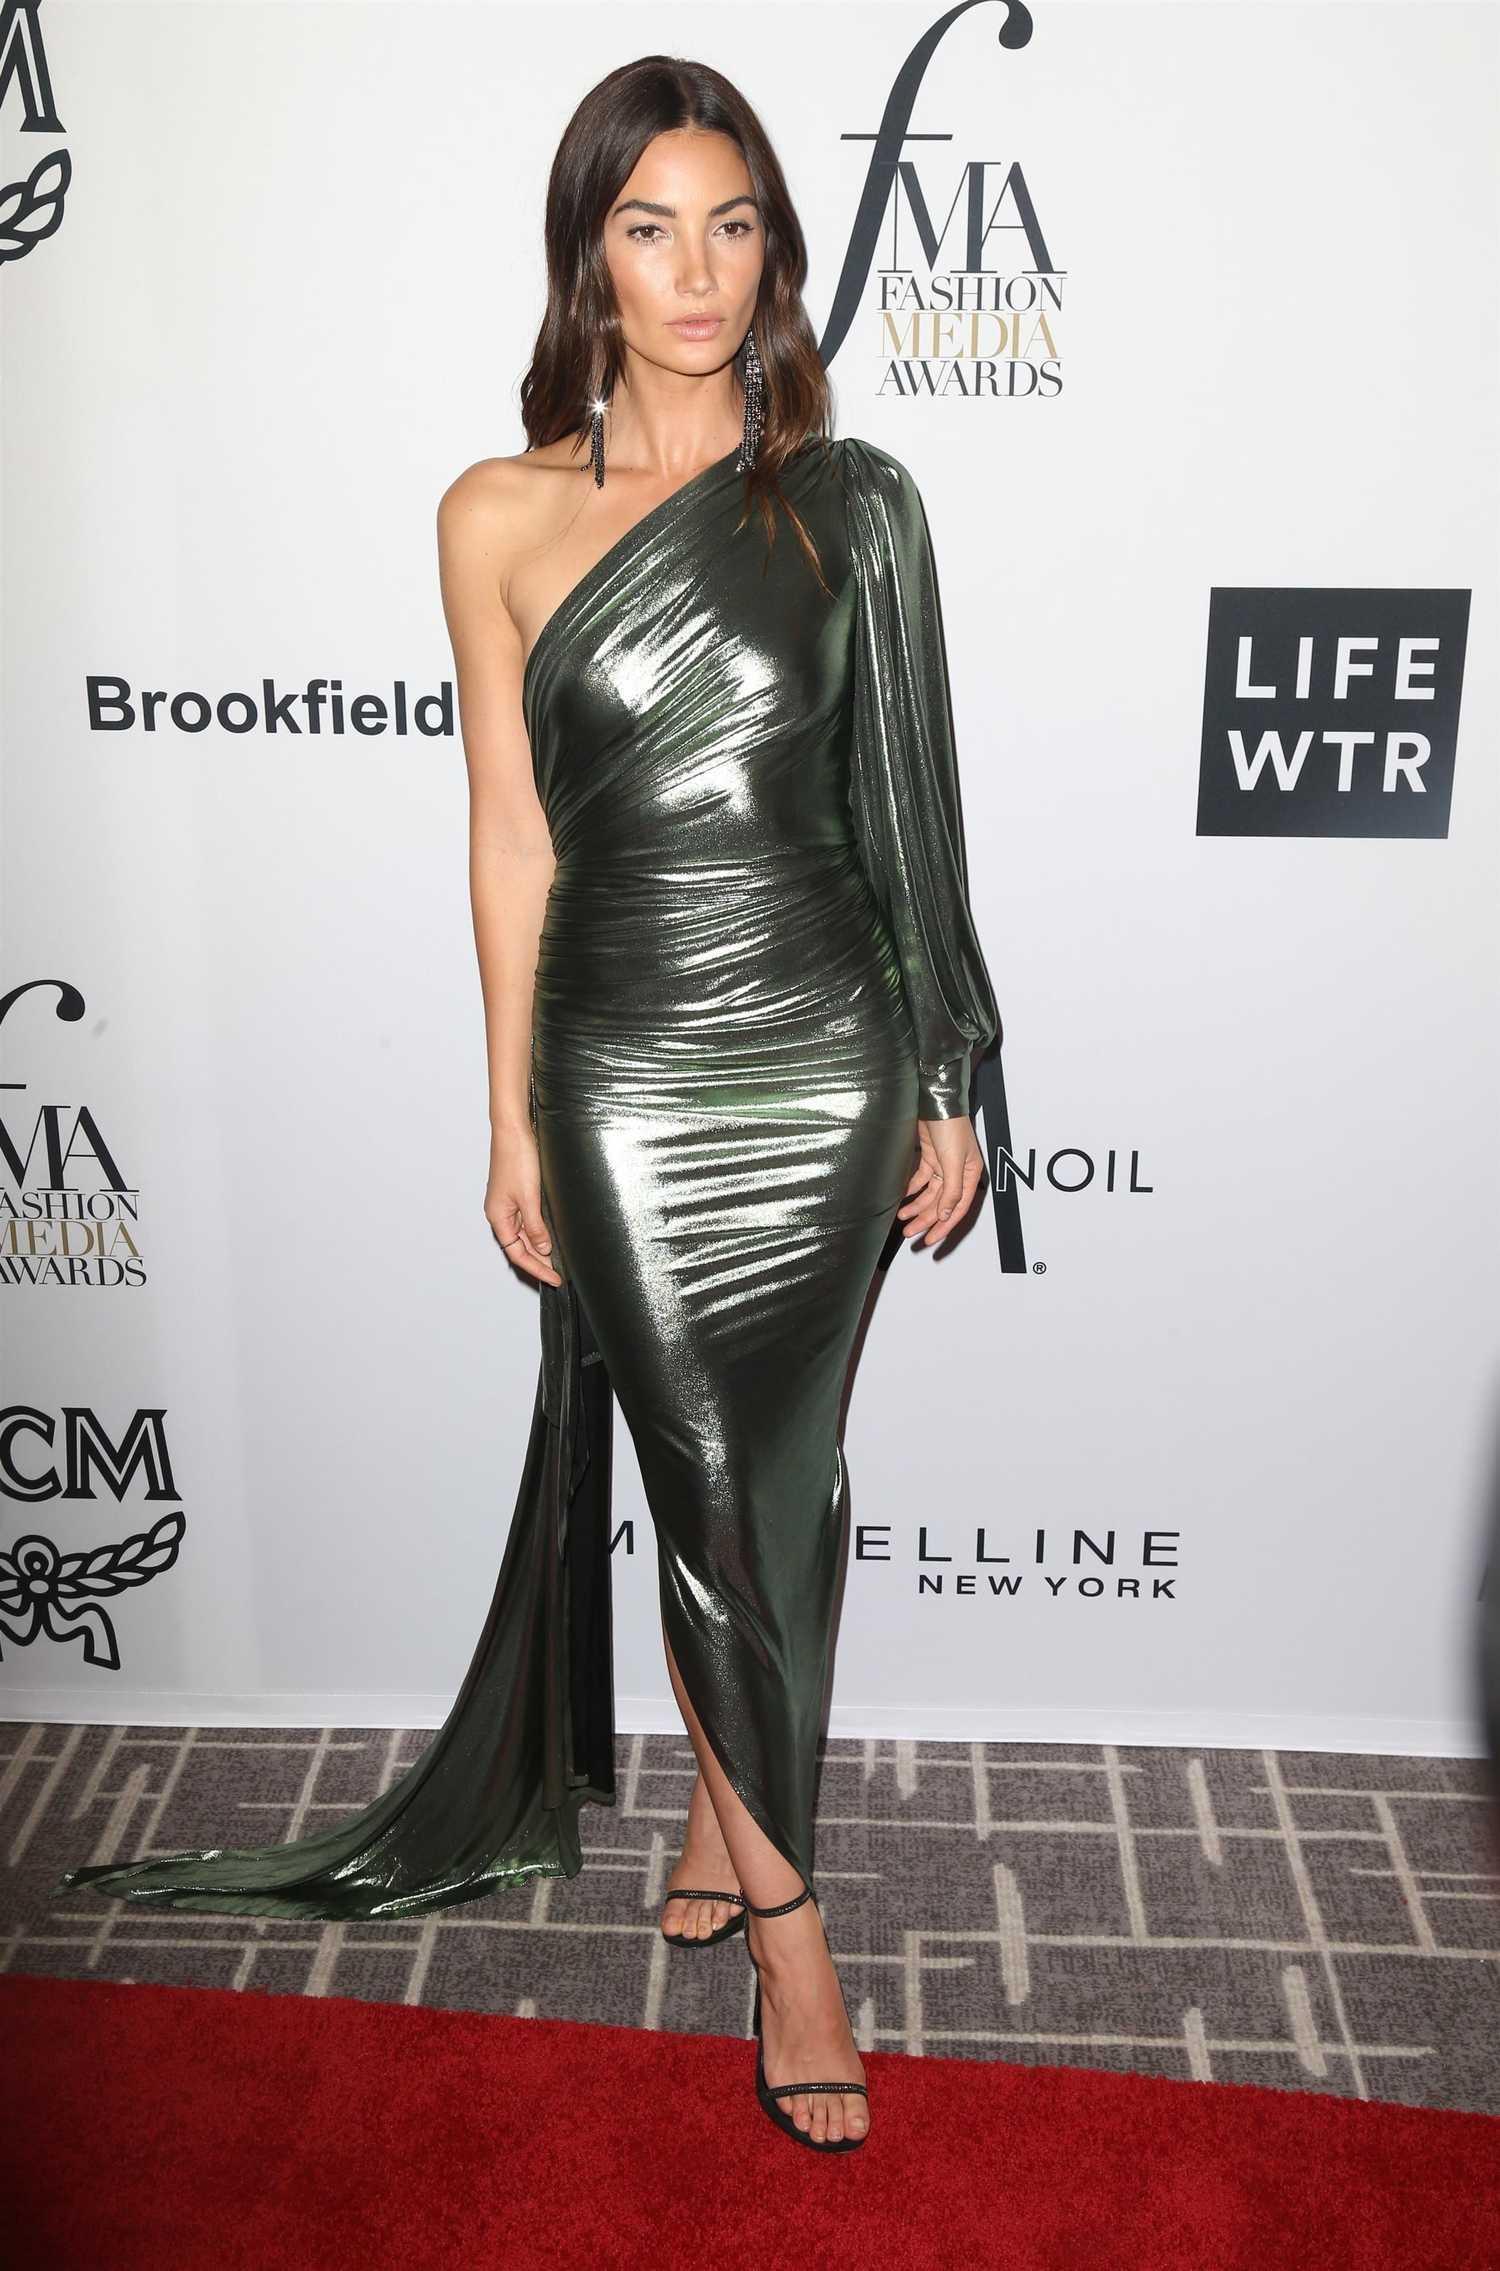 Lily Aldridge At Daily Front Row Fashion Awards During New York Fashion Week Celeb Donut